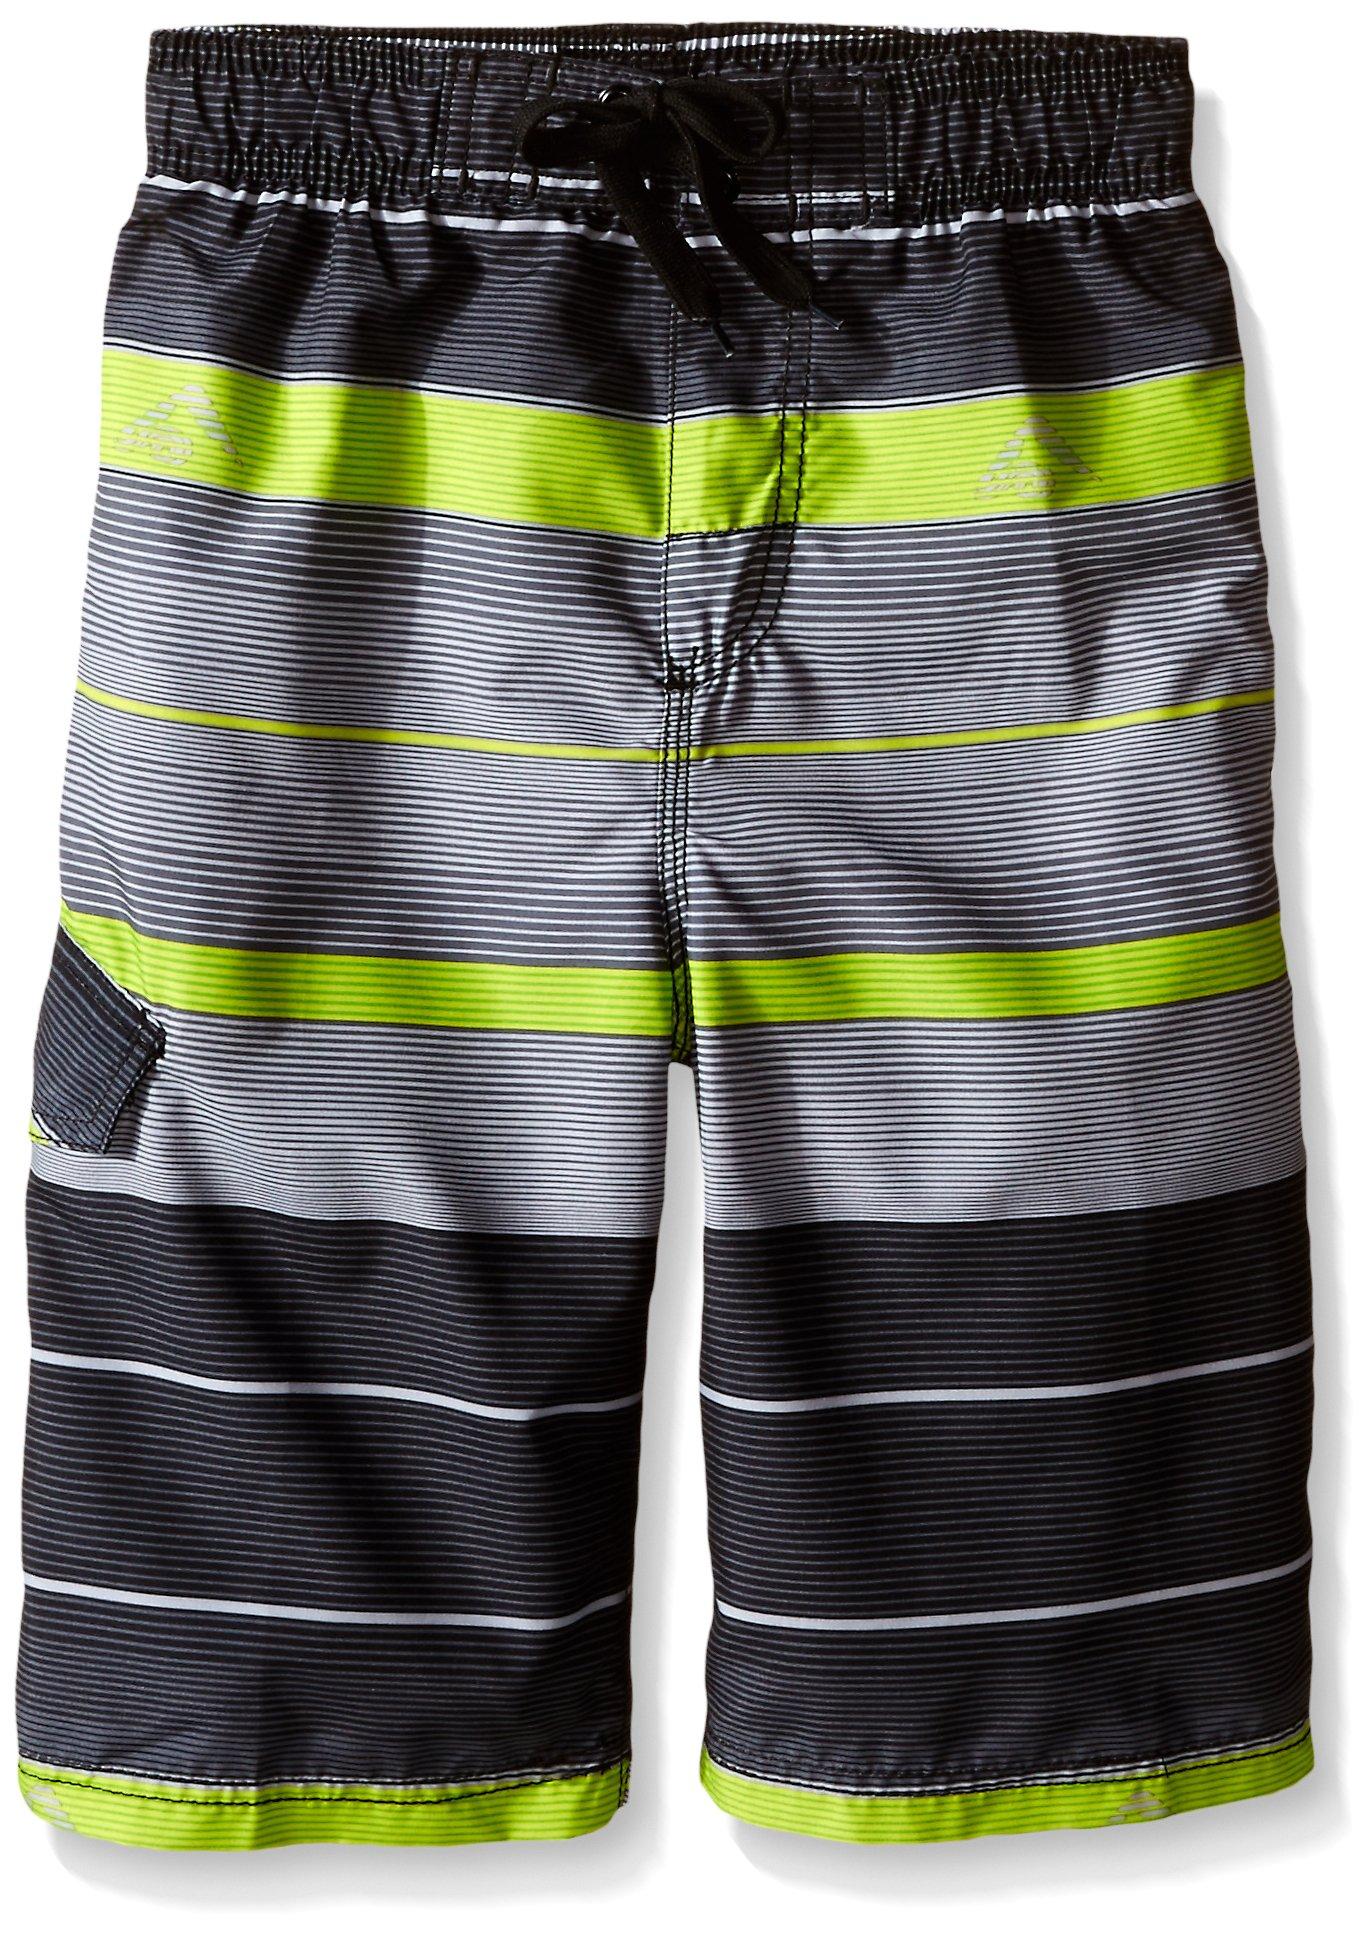 Kanu Surf Big Boys' Specter Stripe Swim Trunk, Charcoal, Large (14/16)